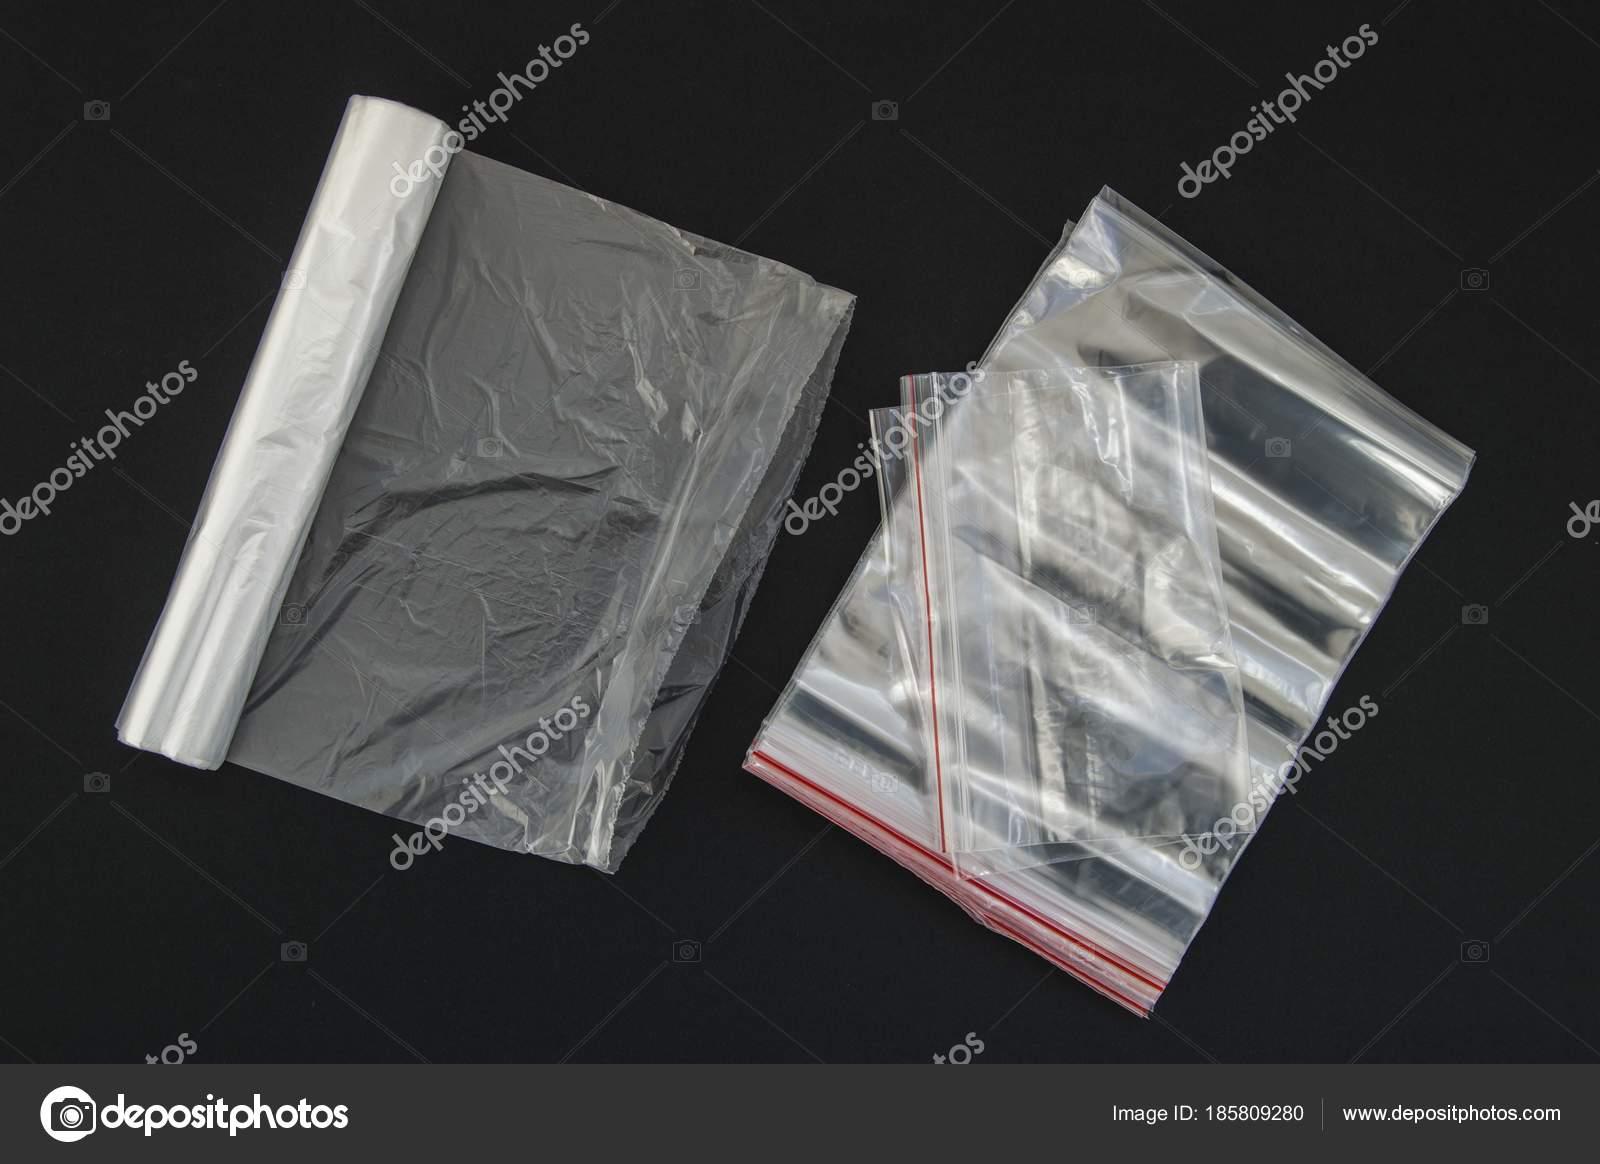 Kühlschrank Aufbewahrung : Unverschlossene beutel den kühlschrank zur aufbewahrung von